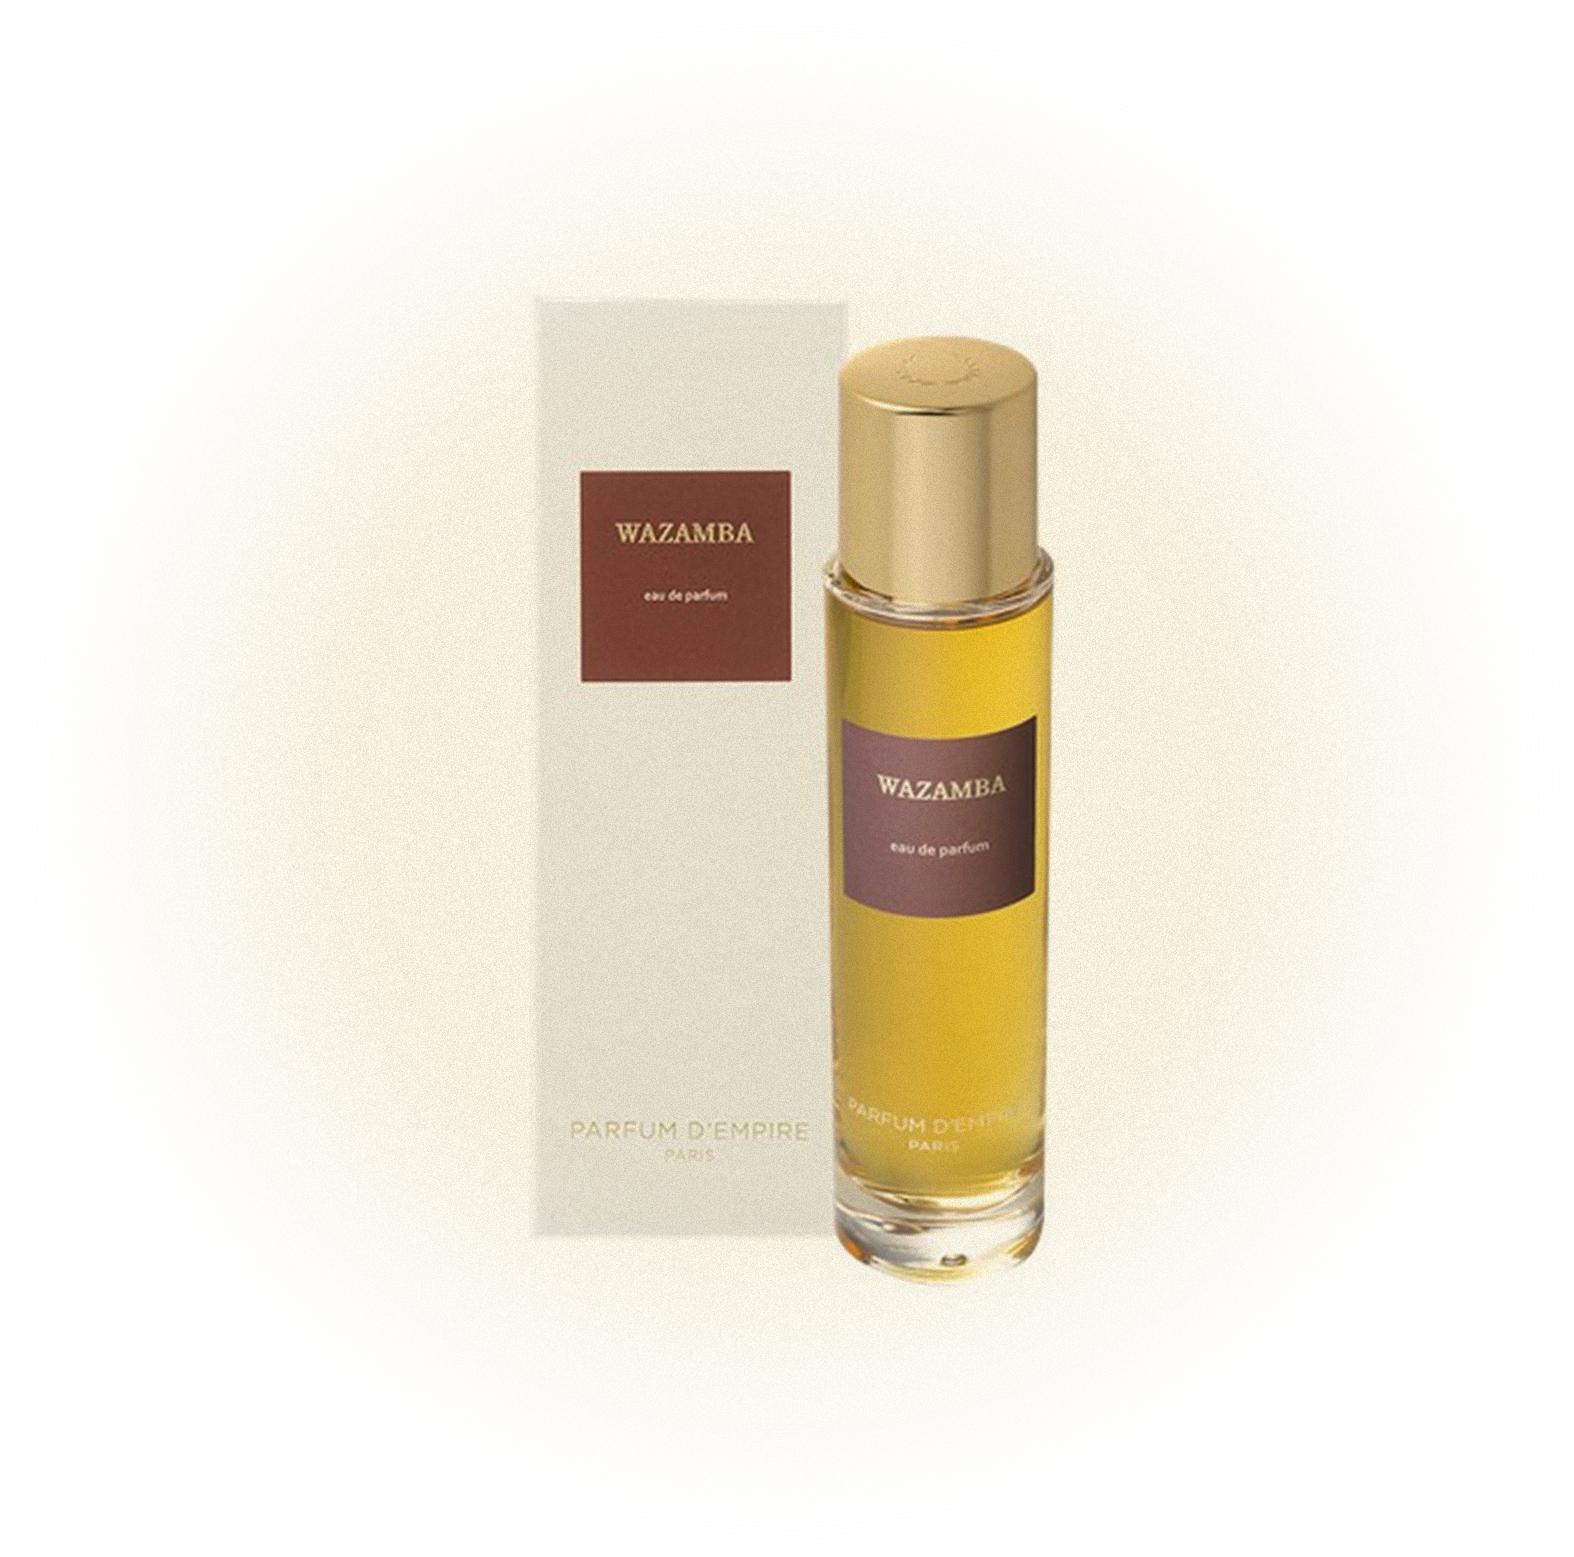 Wazamba, Parfum d'Empire